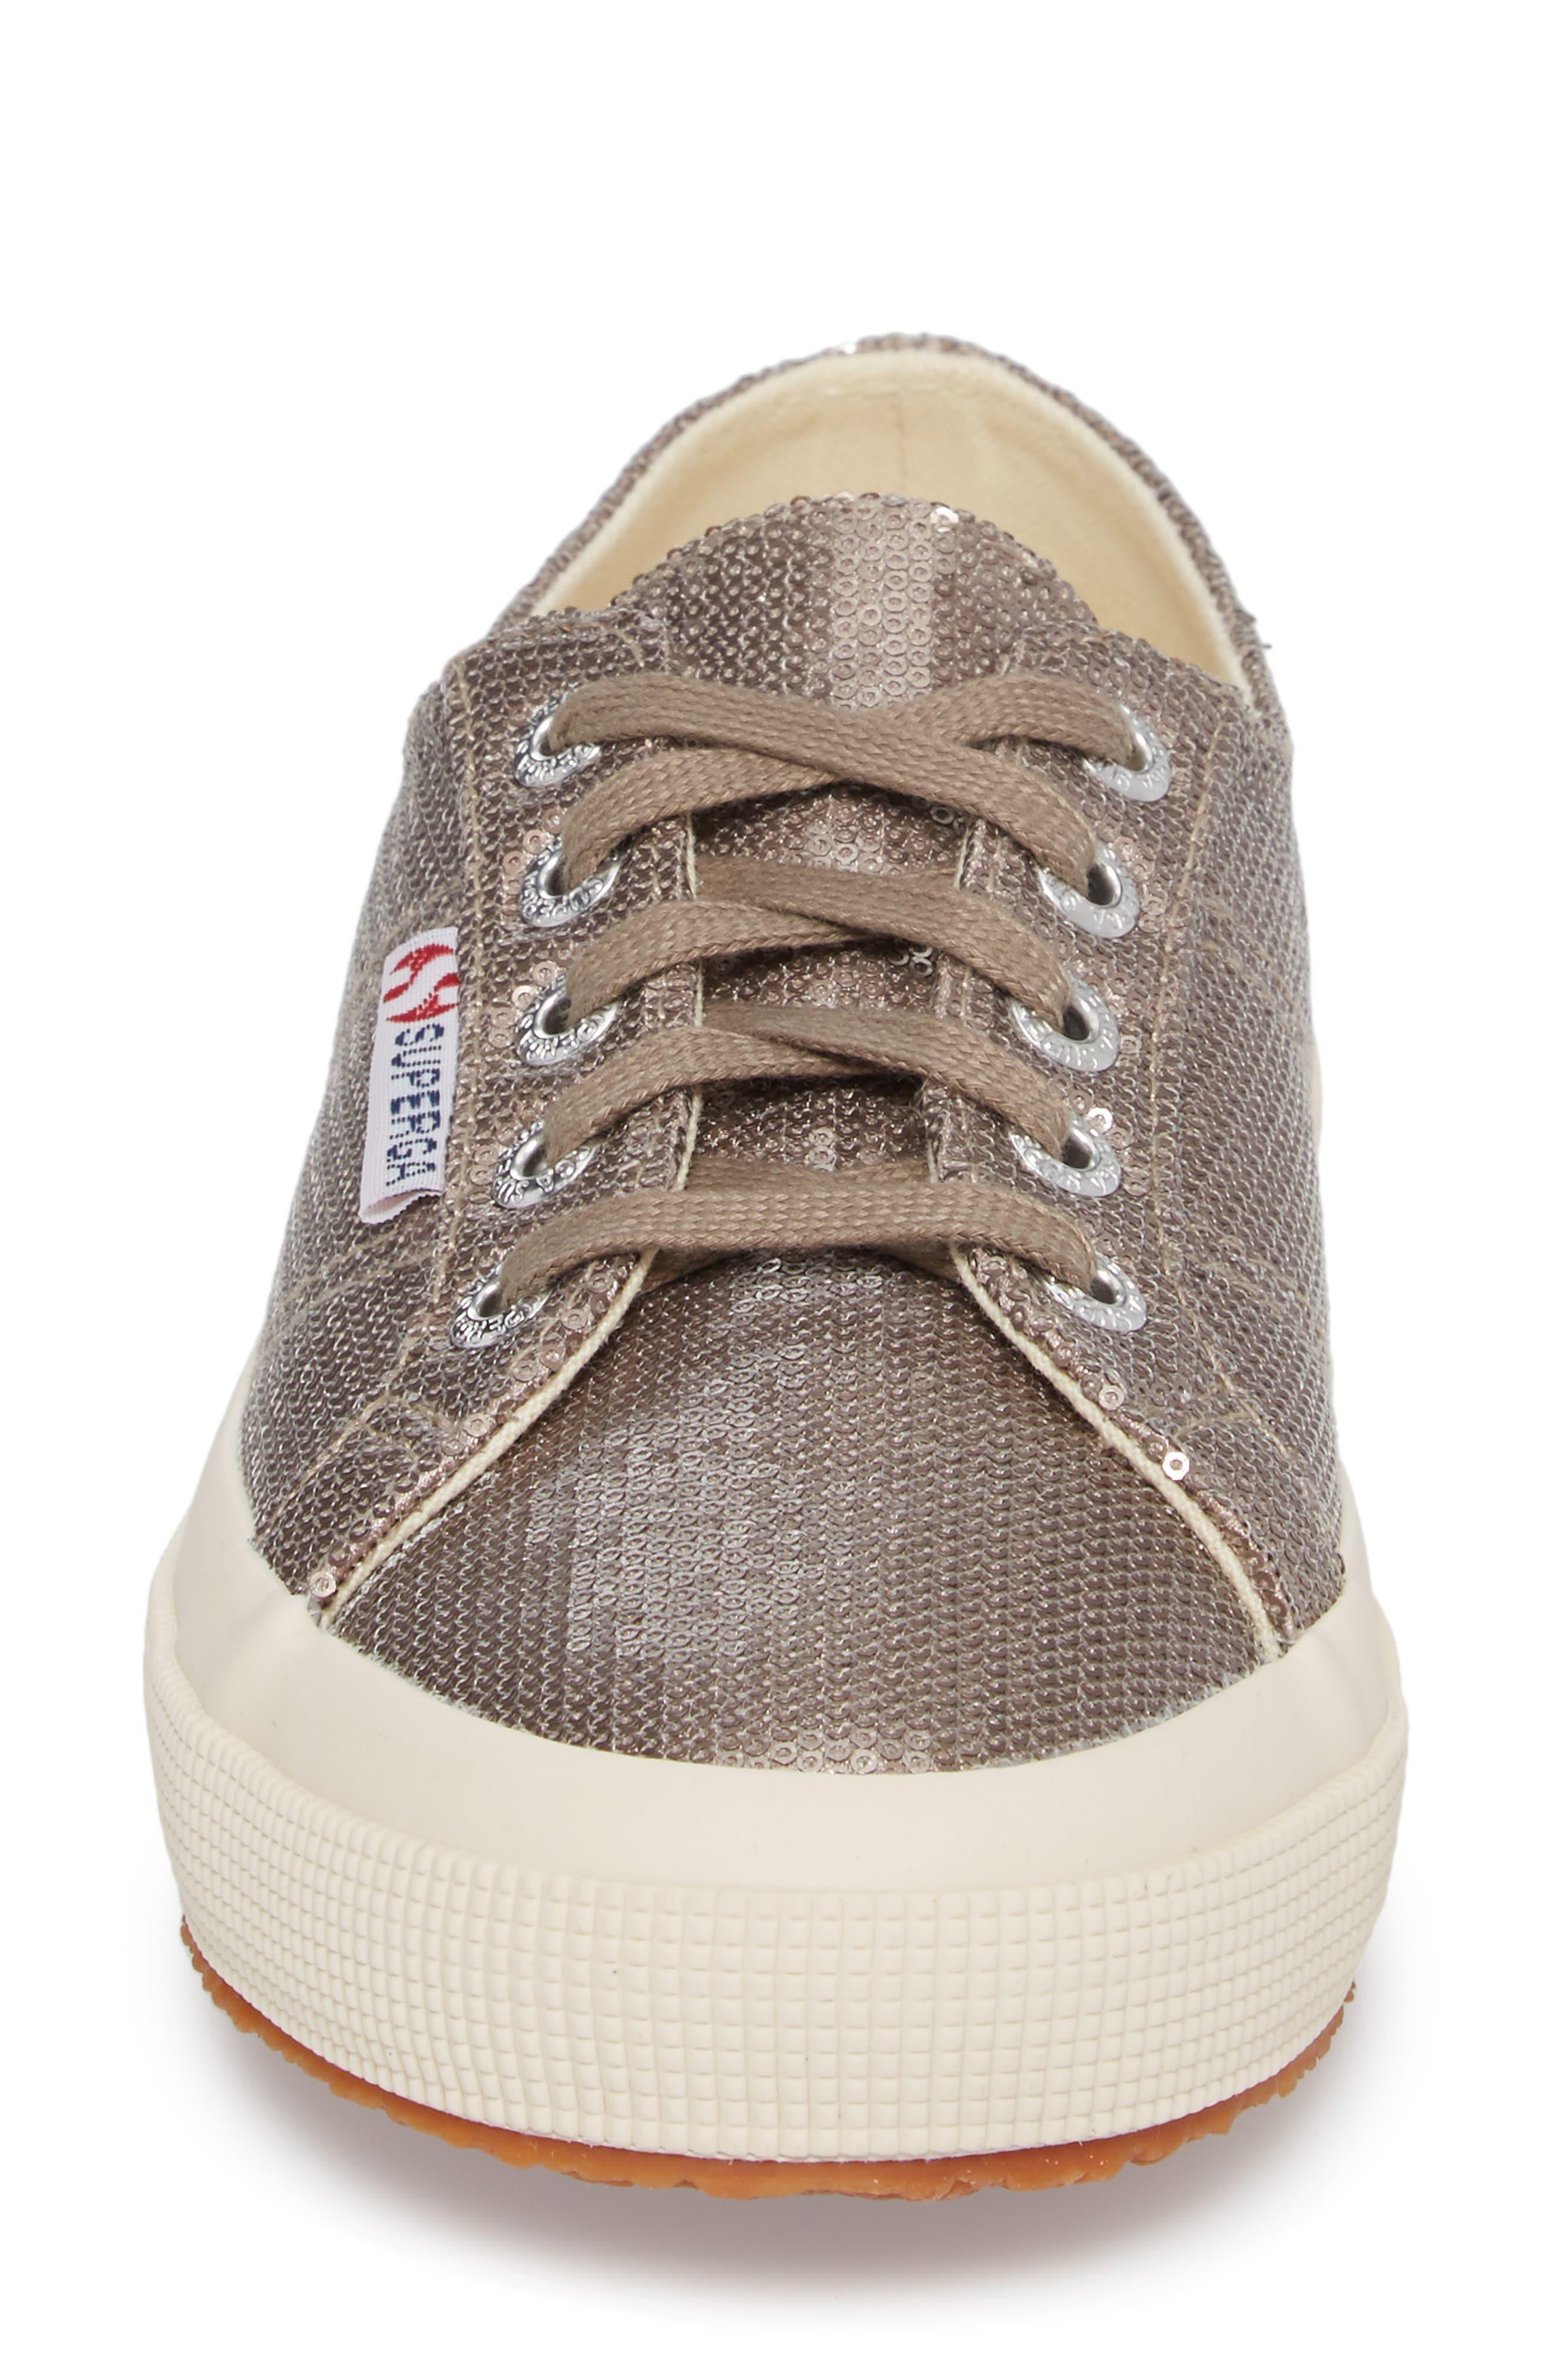 2750 Micro Sequin Sneaker,                             Alternate thumbnail 4, color,                             227